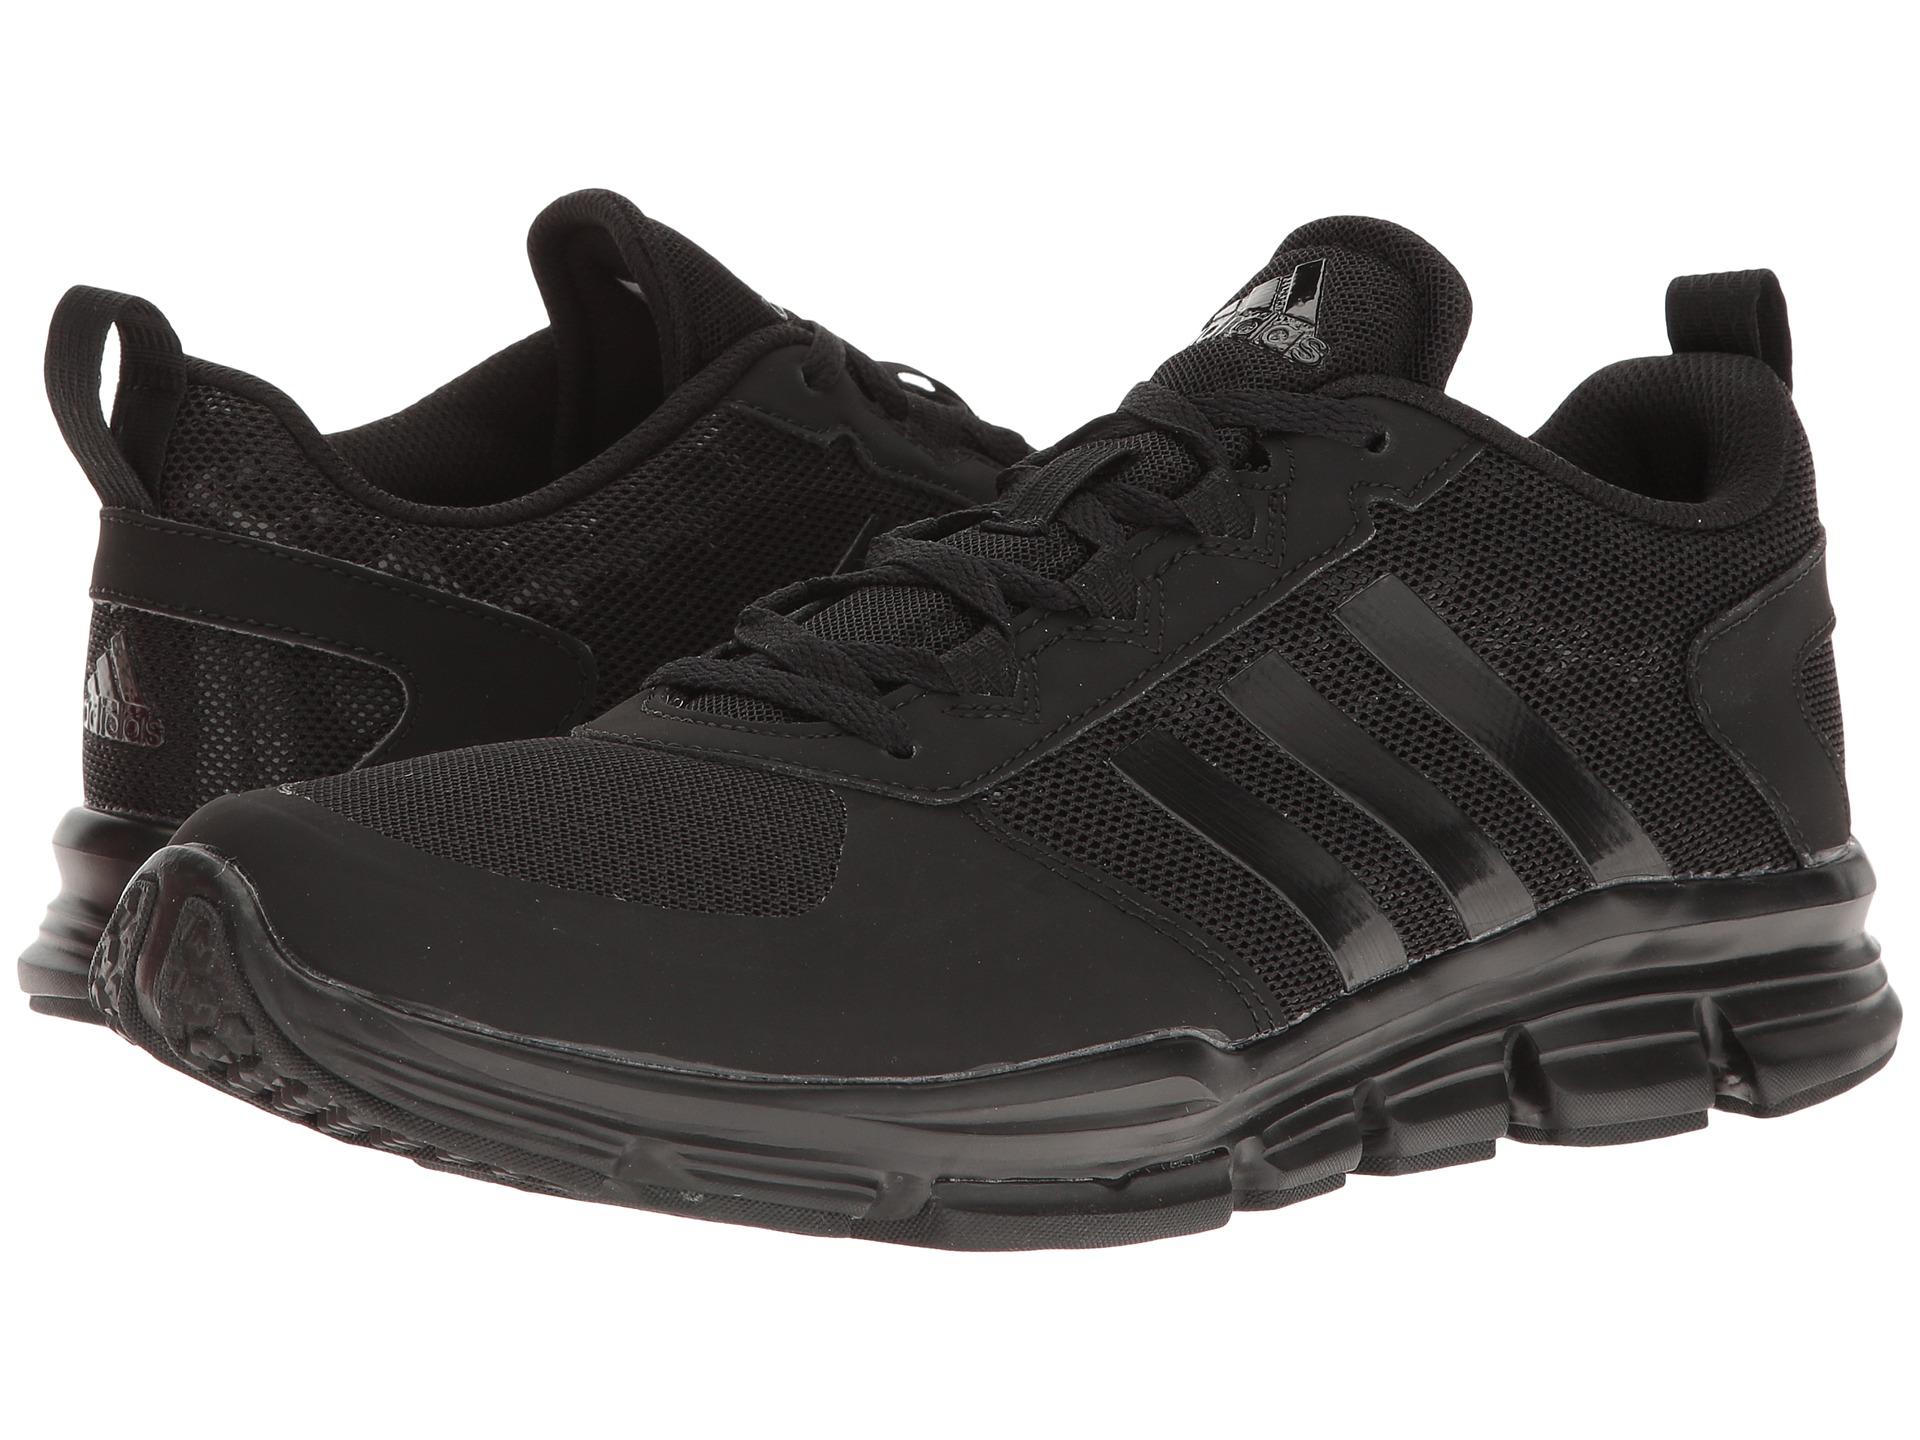 adidas Speed Trainer 2 at 6pm.com